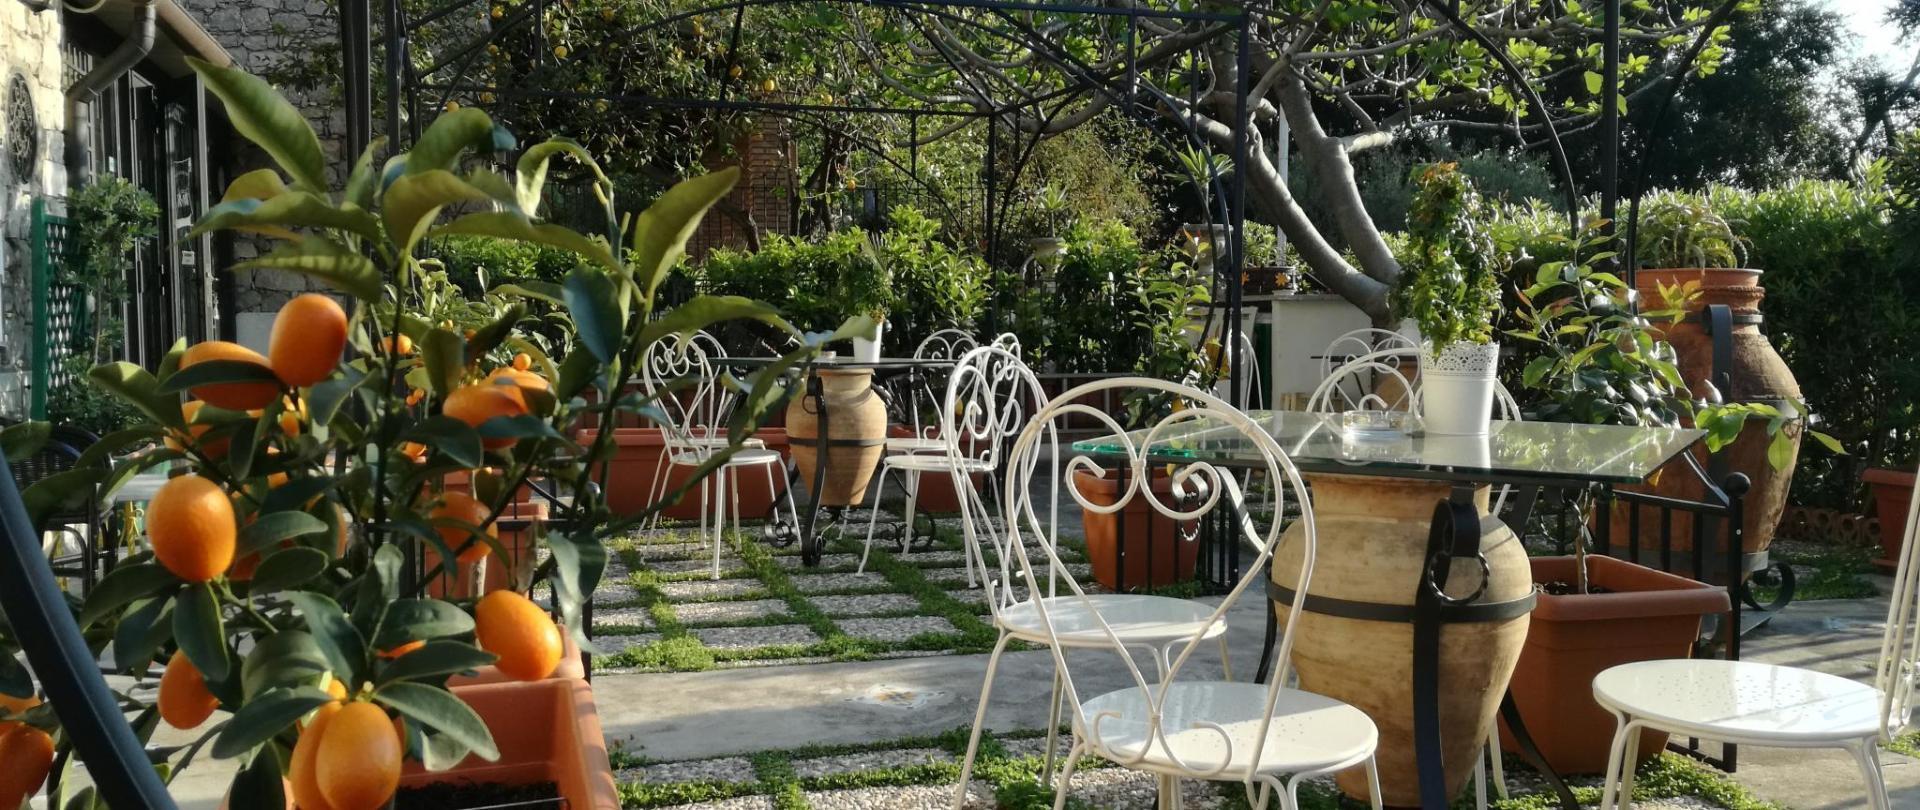 B & B_Villa_Schiticchiu_Taormina_garden1.jpg